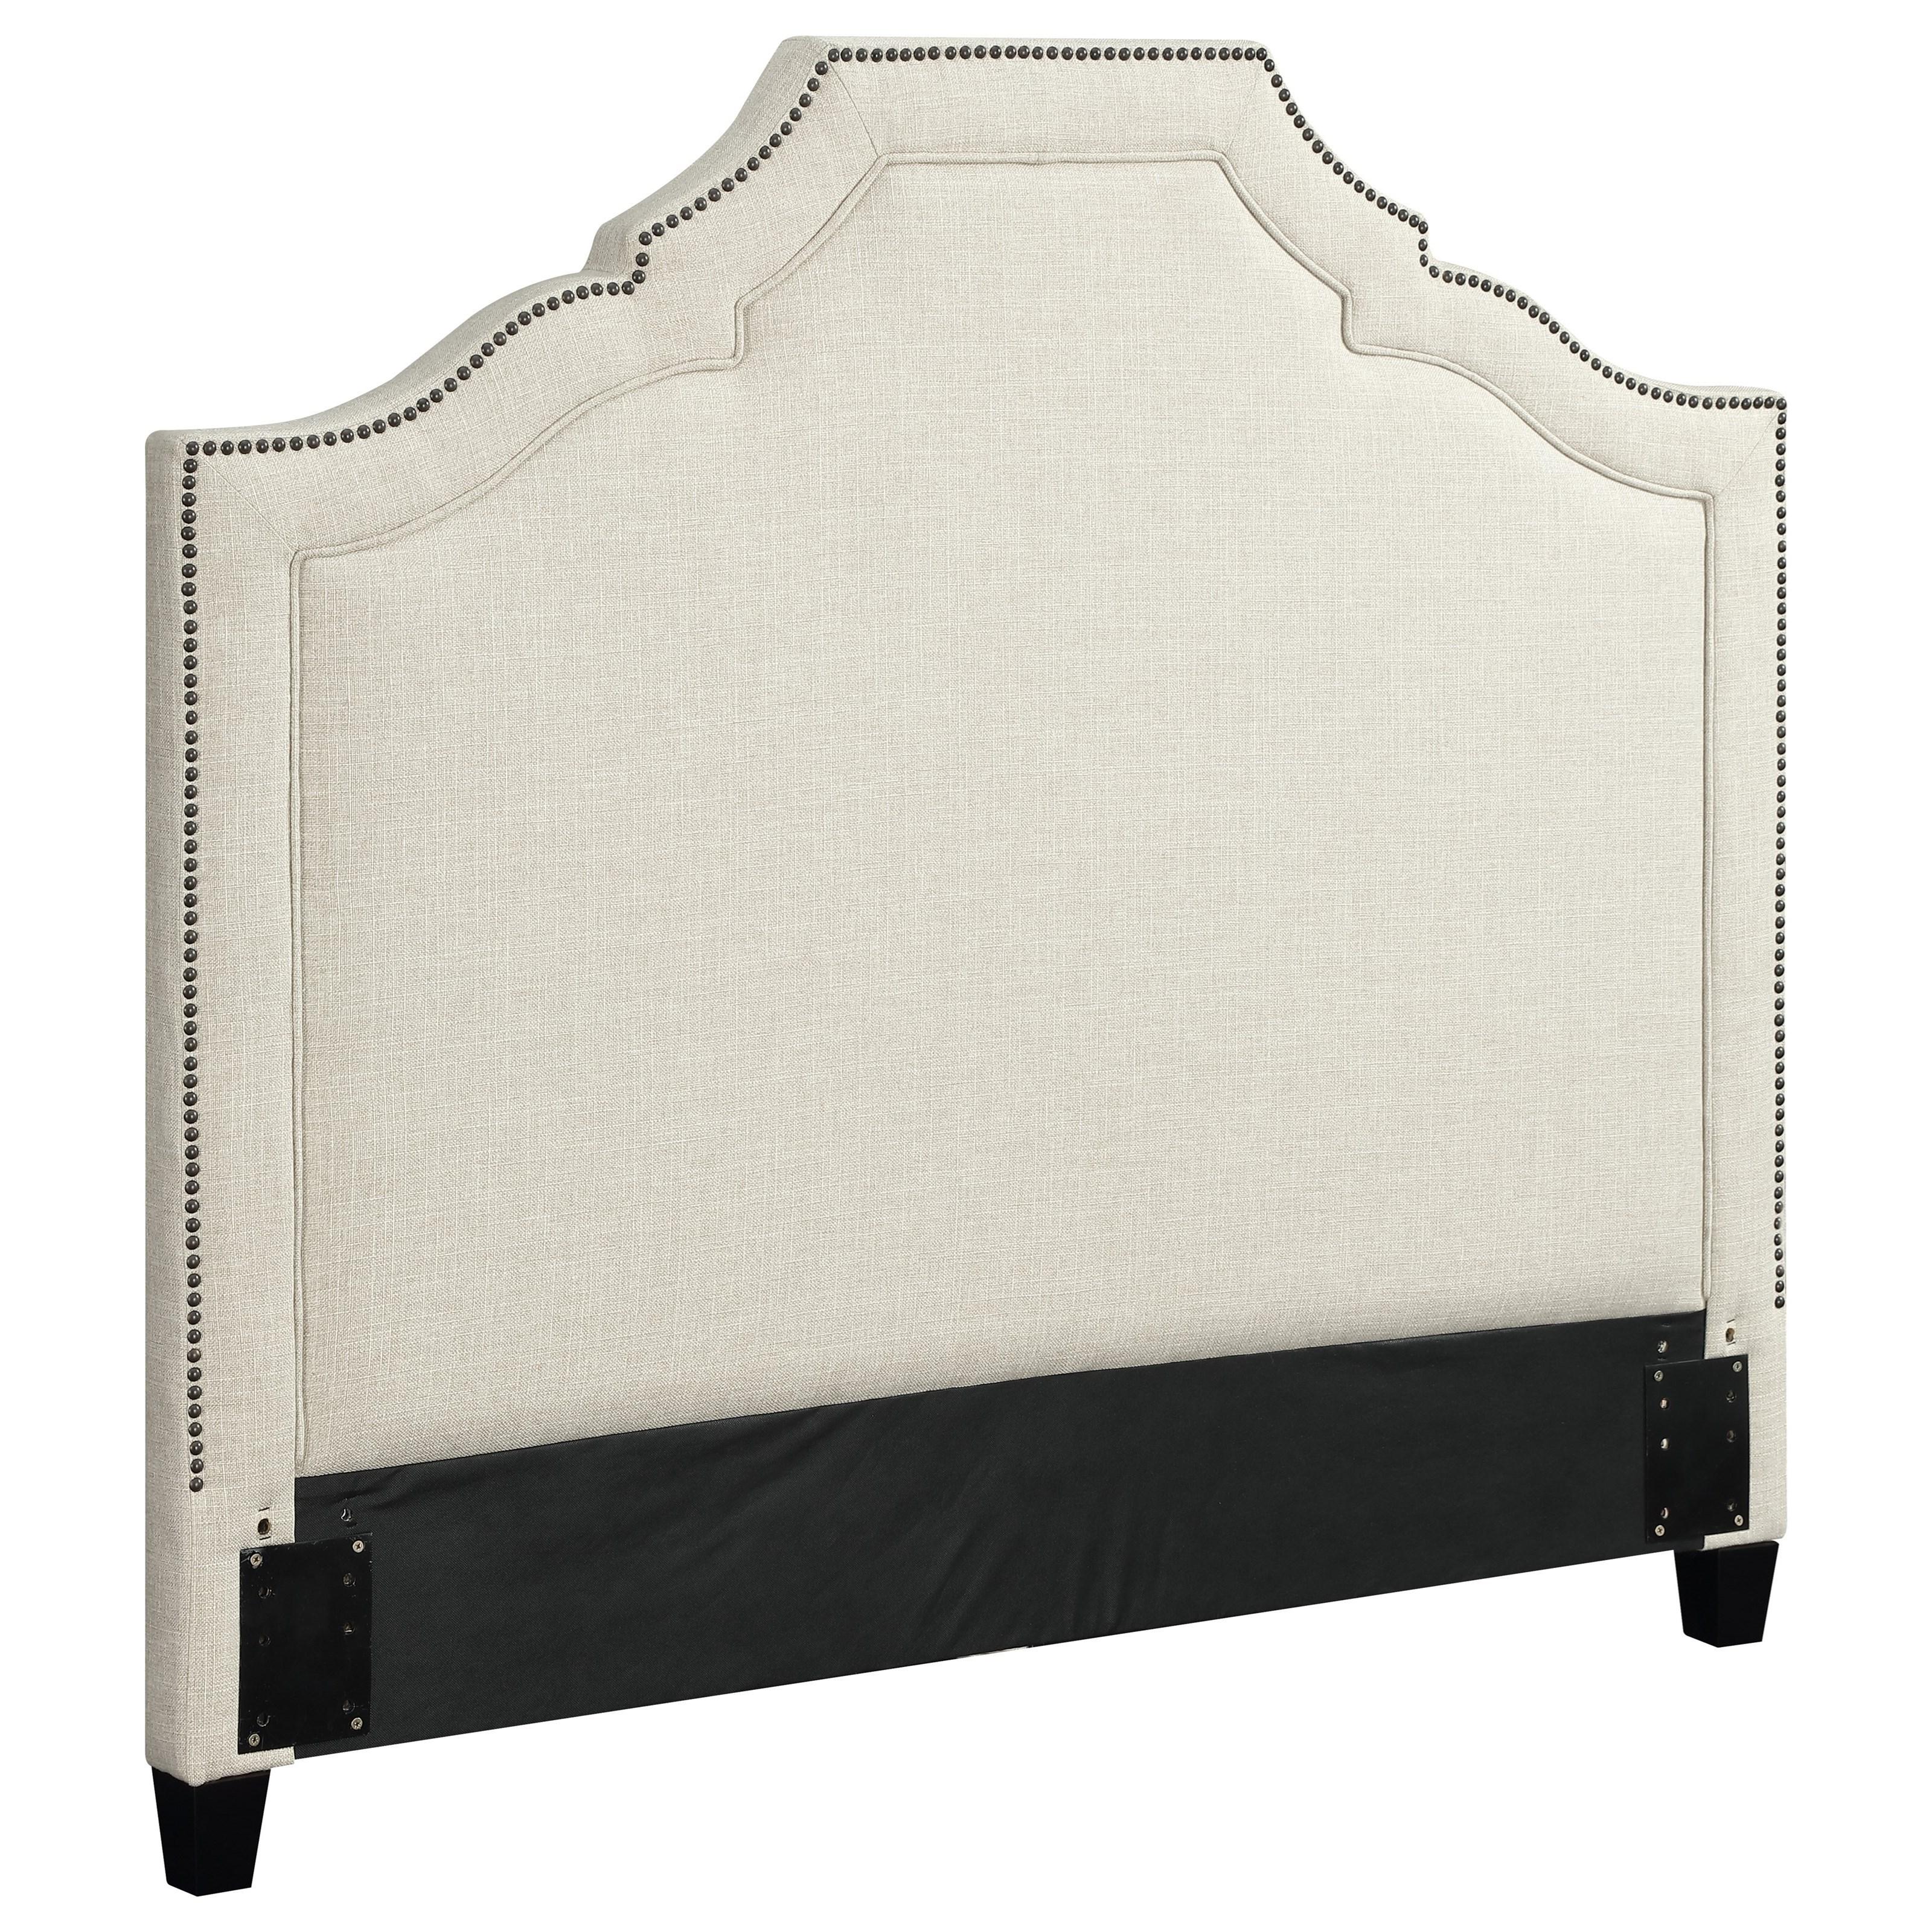 Coaster Upholstered Beds Queen Headboard - Item Number: 301091QB1